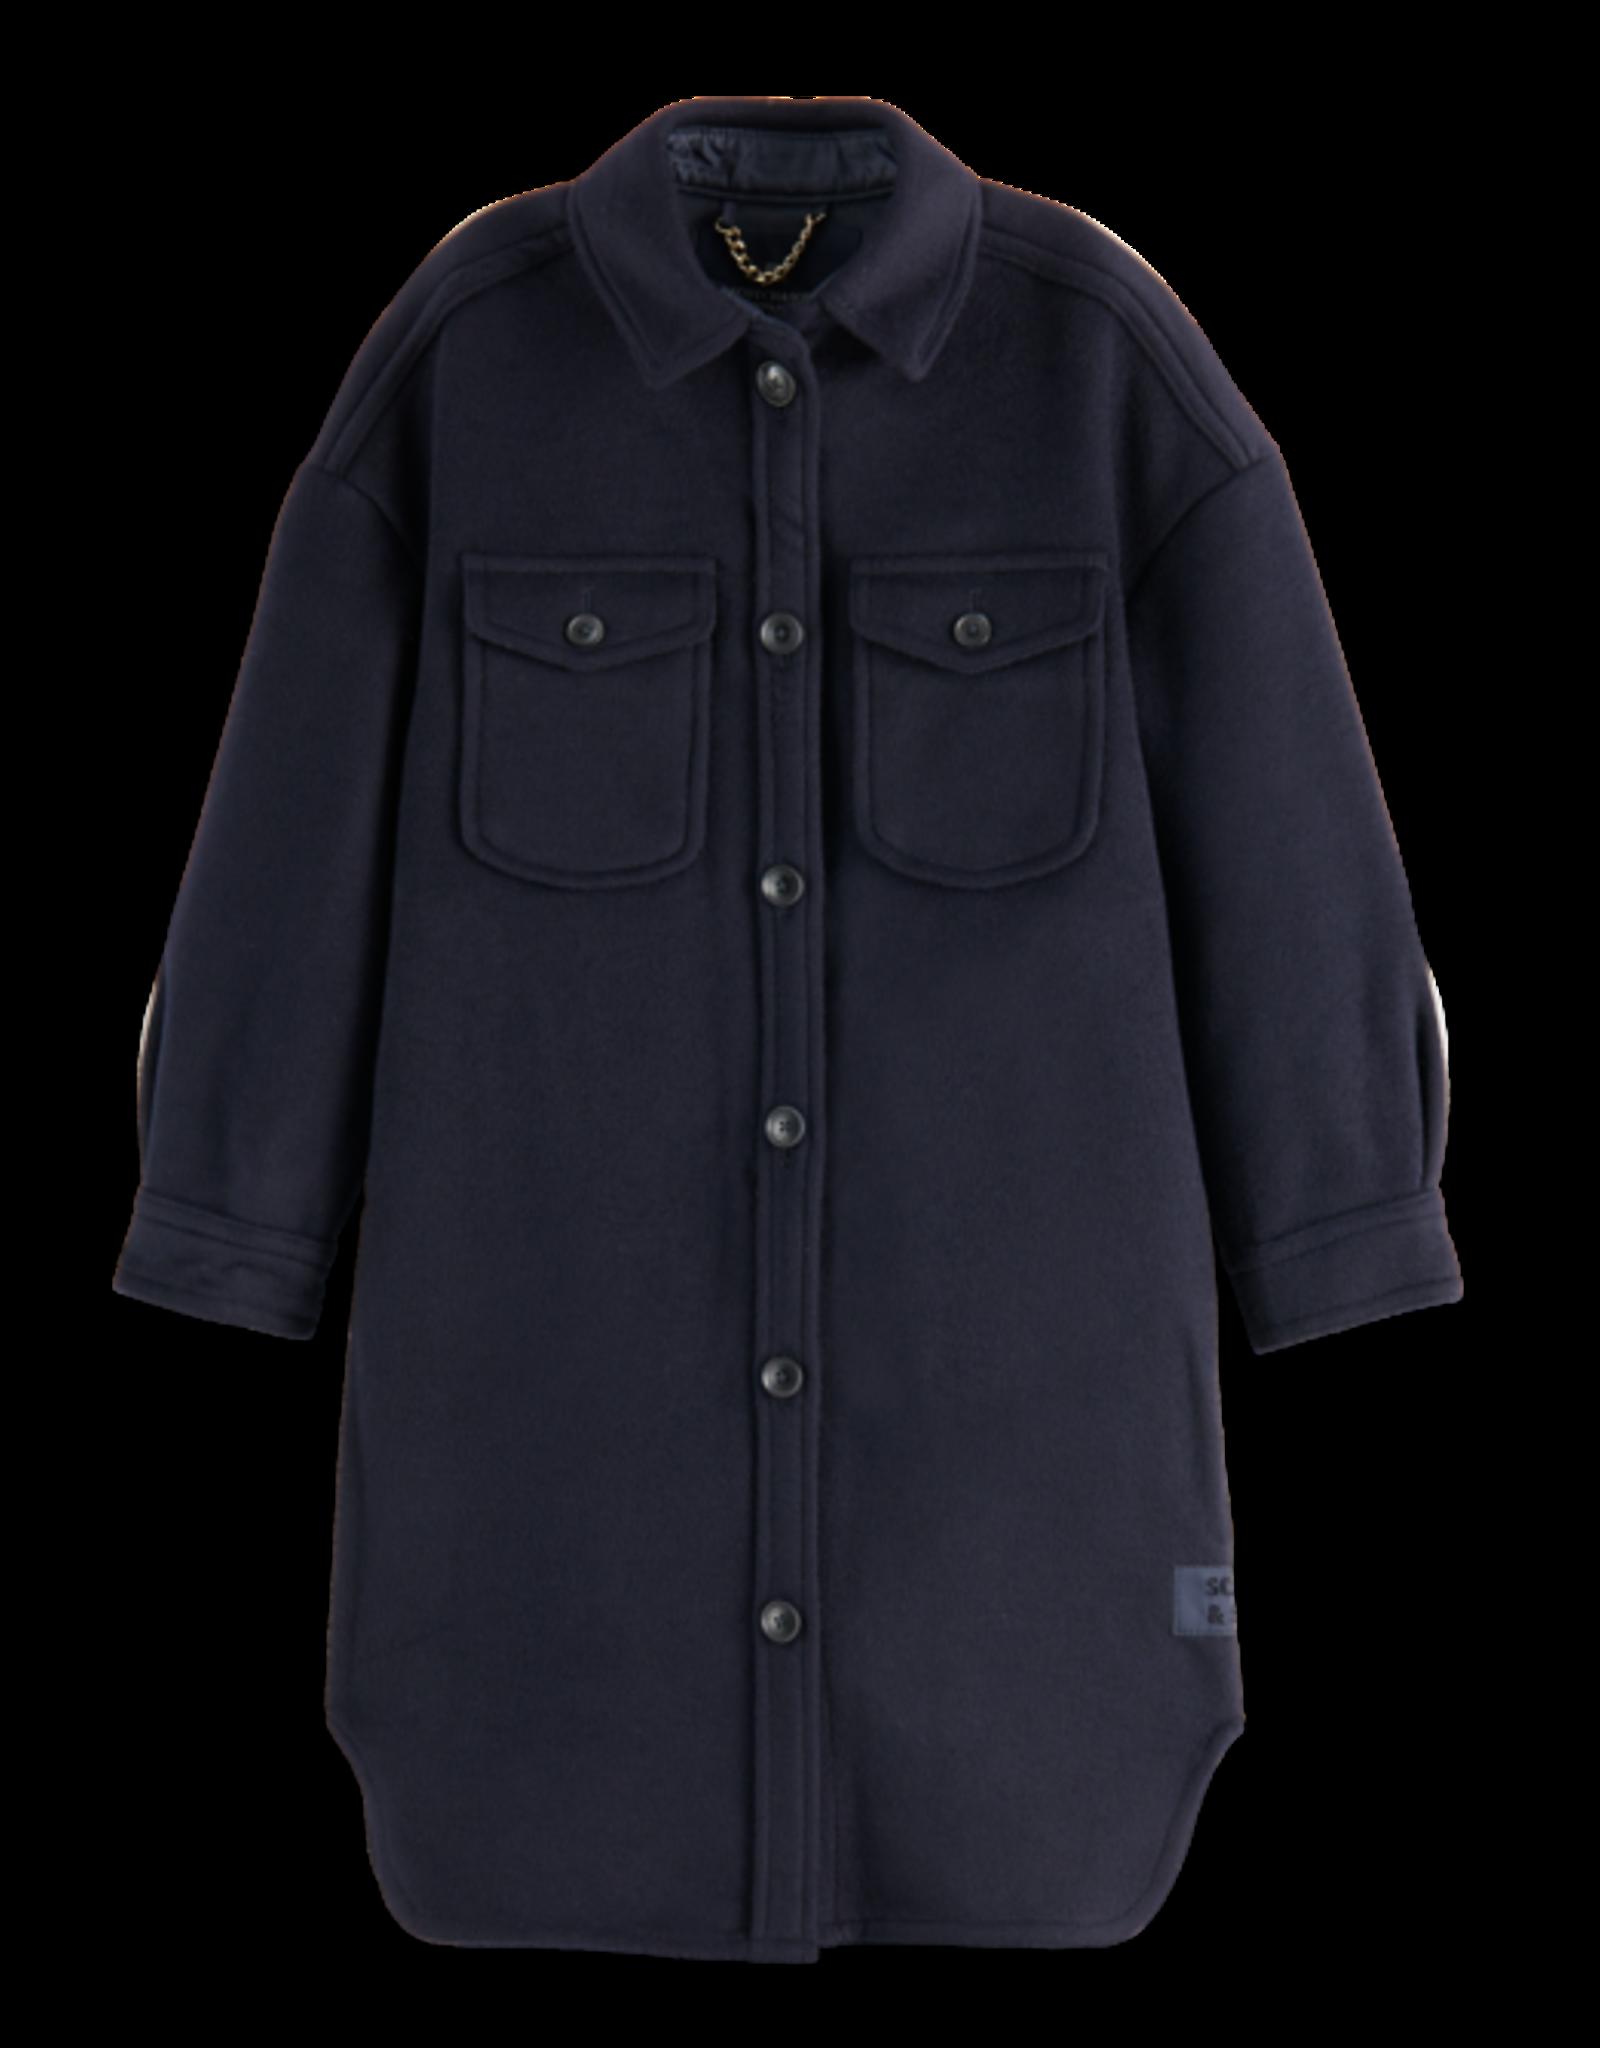 Scotch&Soda Scotch&Soda FW21 161422 woolen jacket